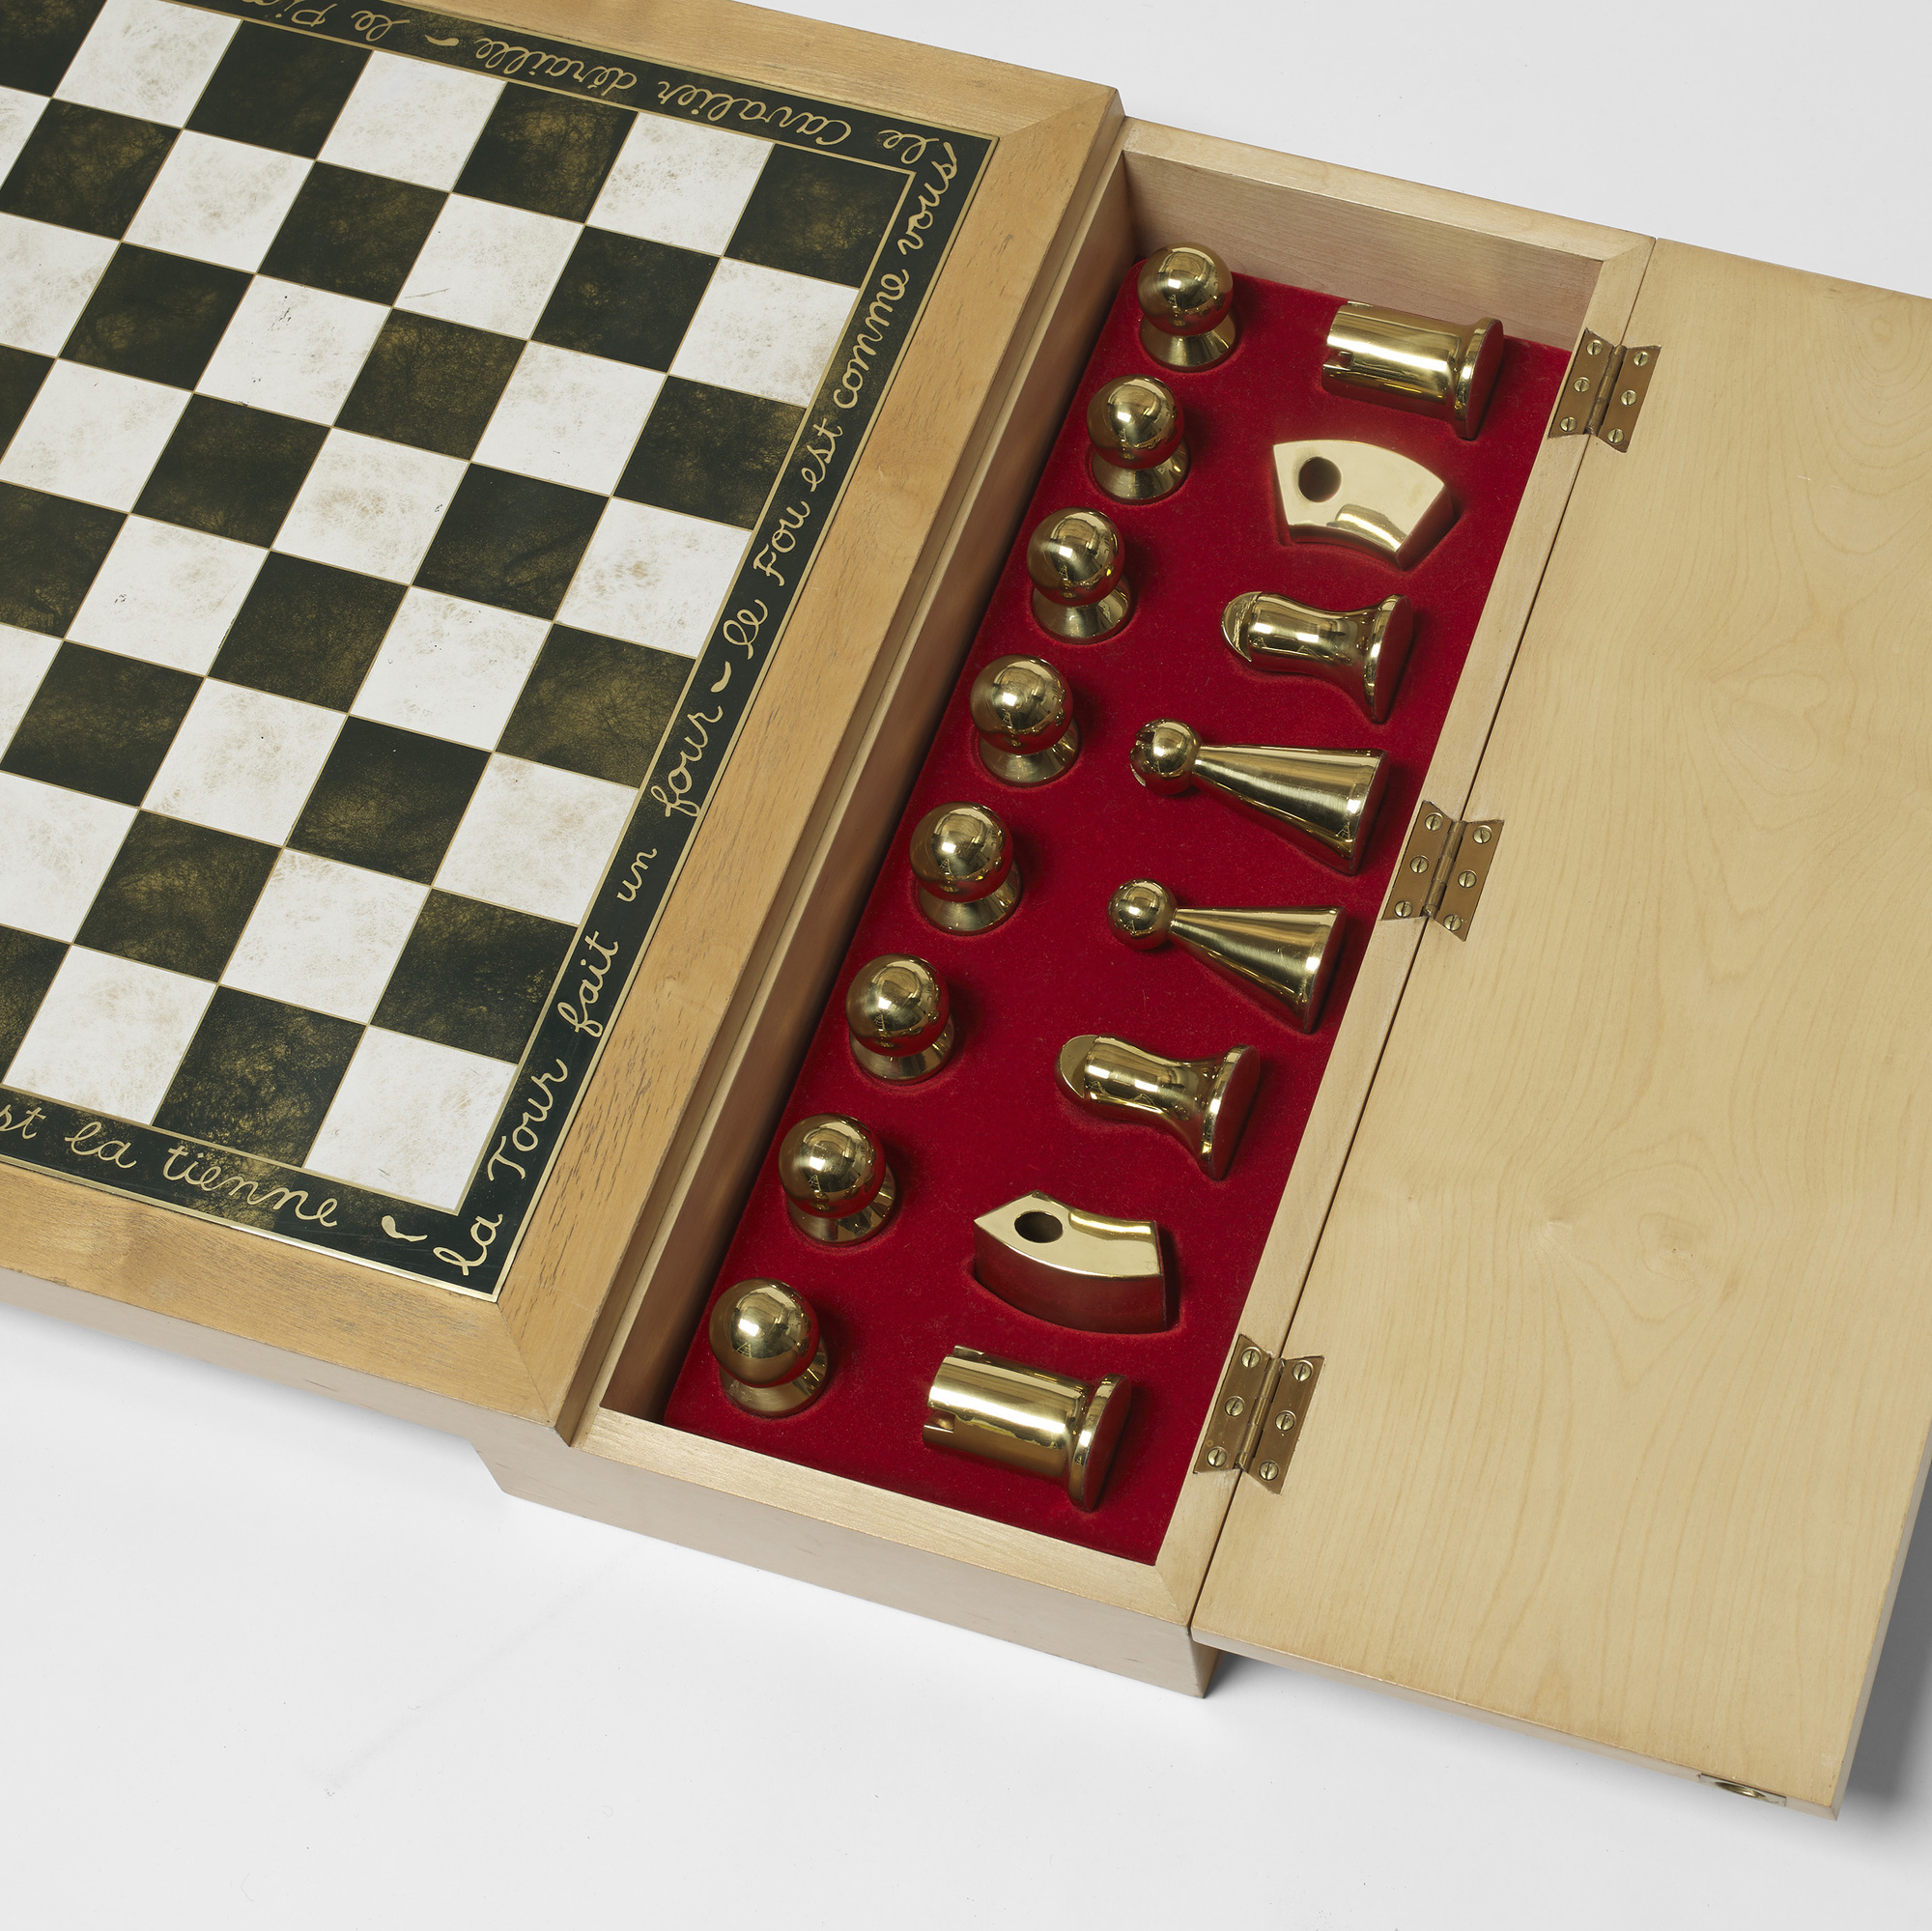 222 man ray chess set u003c art design 24 september 2015